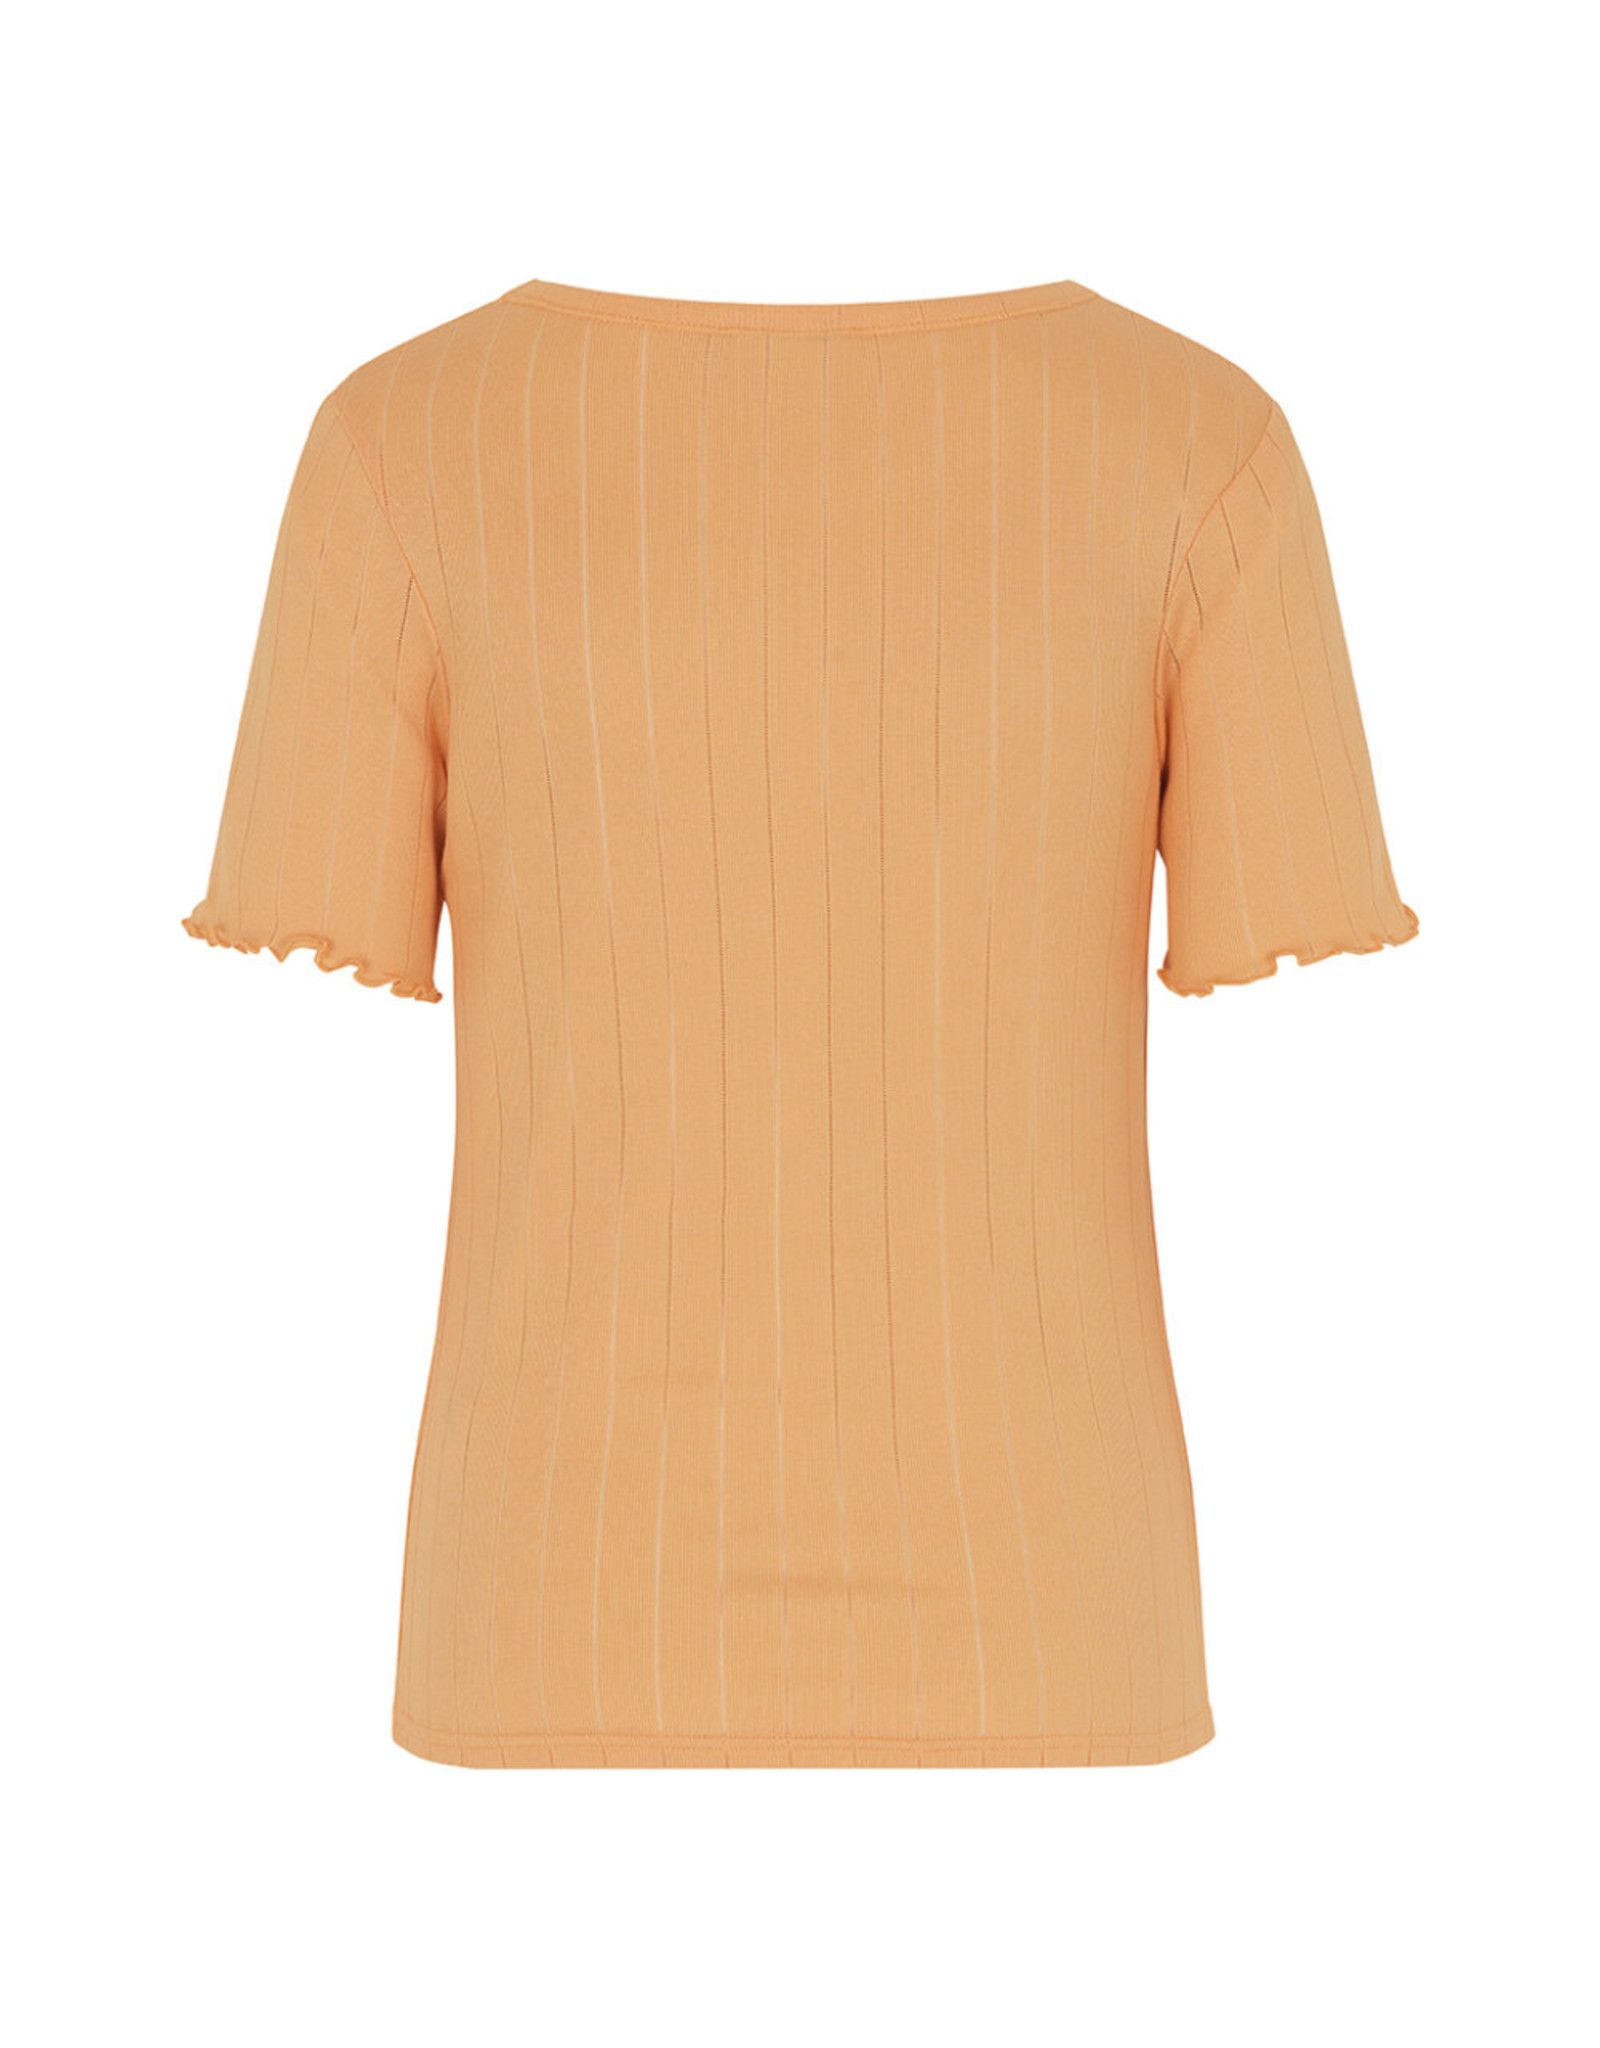 Modstrom Issy T-Shirt Apricot Cream